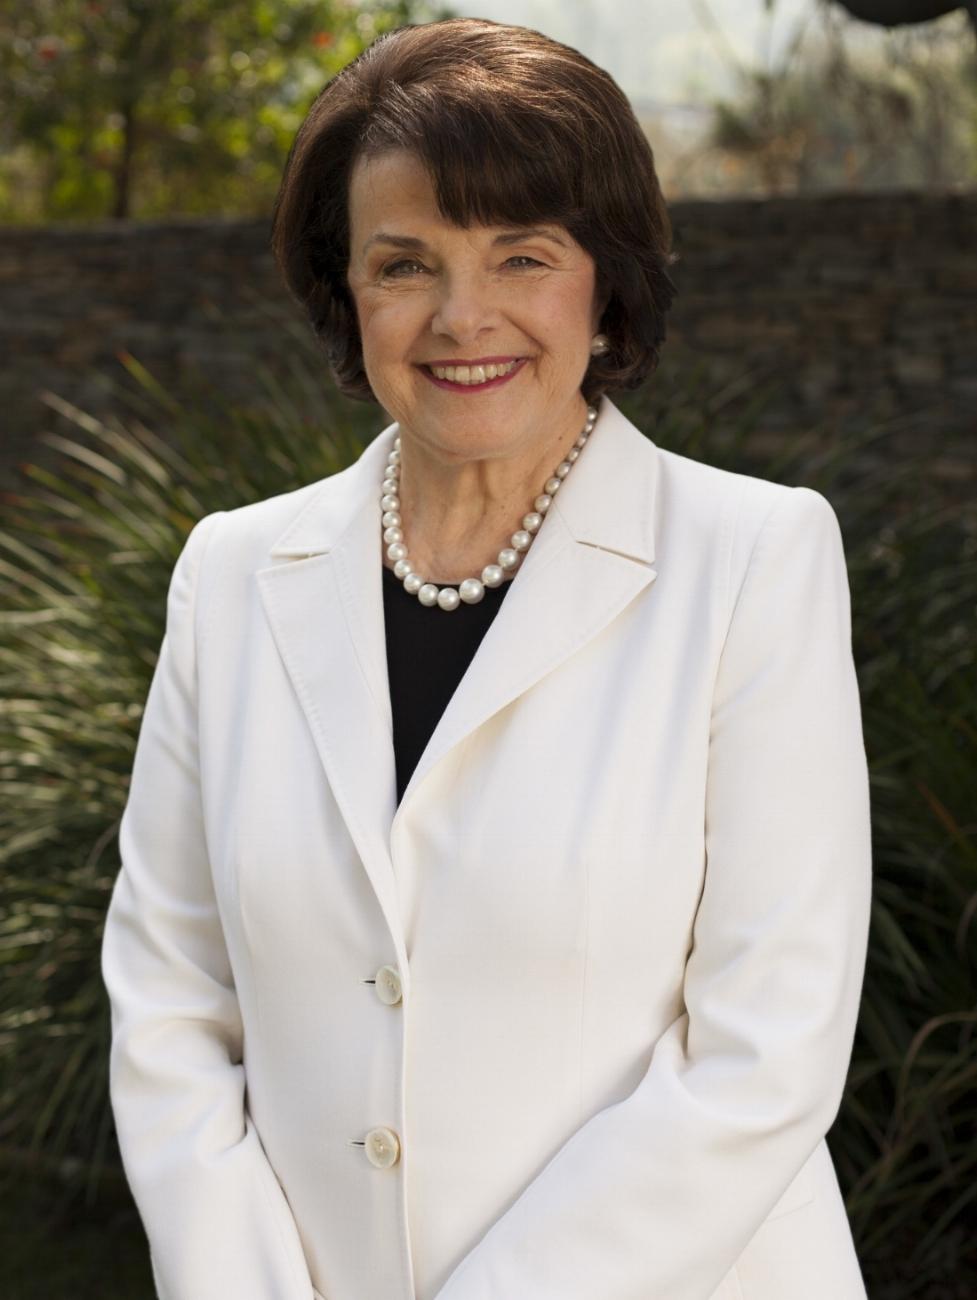 Dianne Feinstein - U.S. Senator